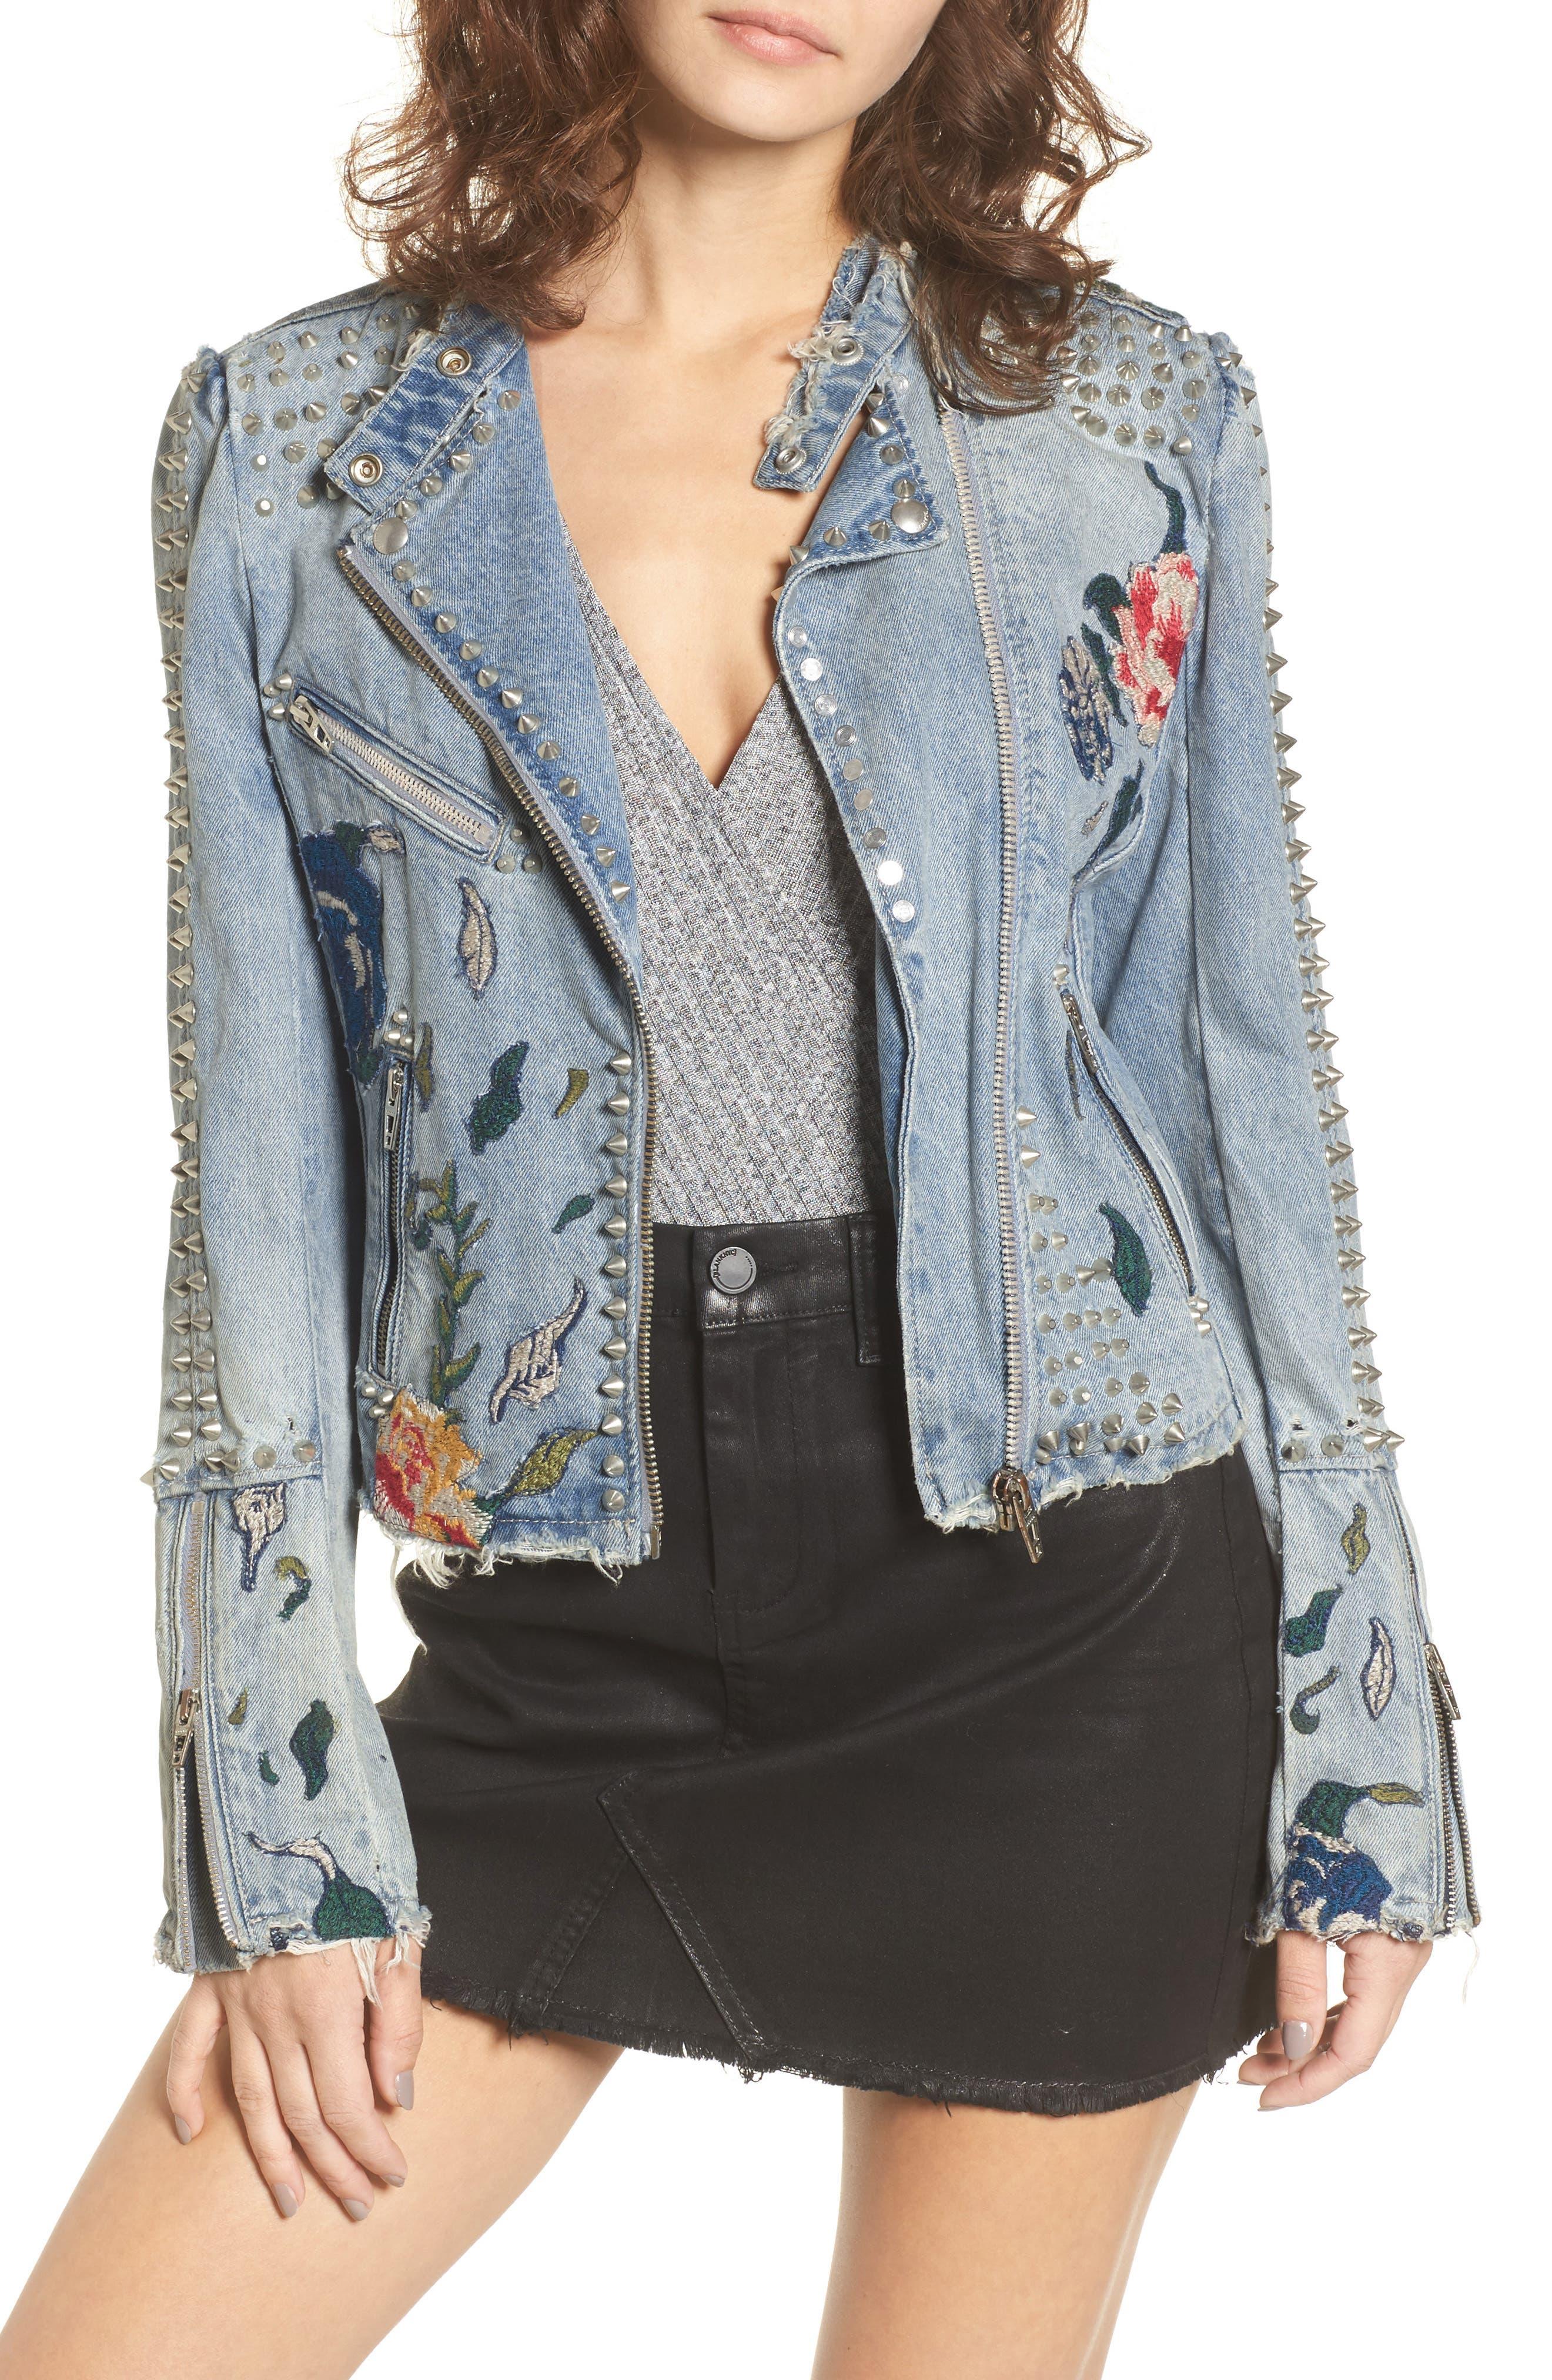 Alternate Image 1 Selected - BLANKNYC Sea of Flowers Studded Denim Moto Jacket